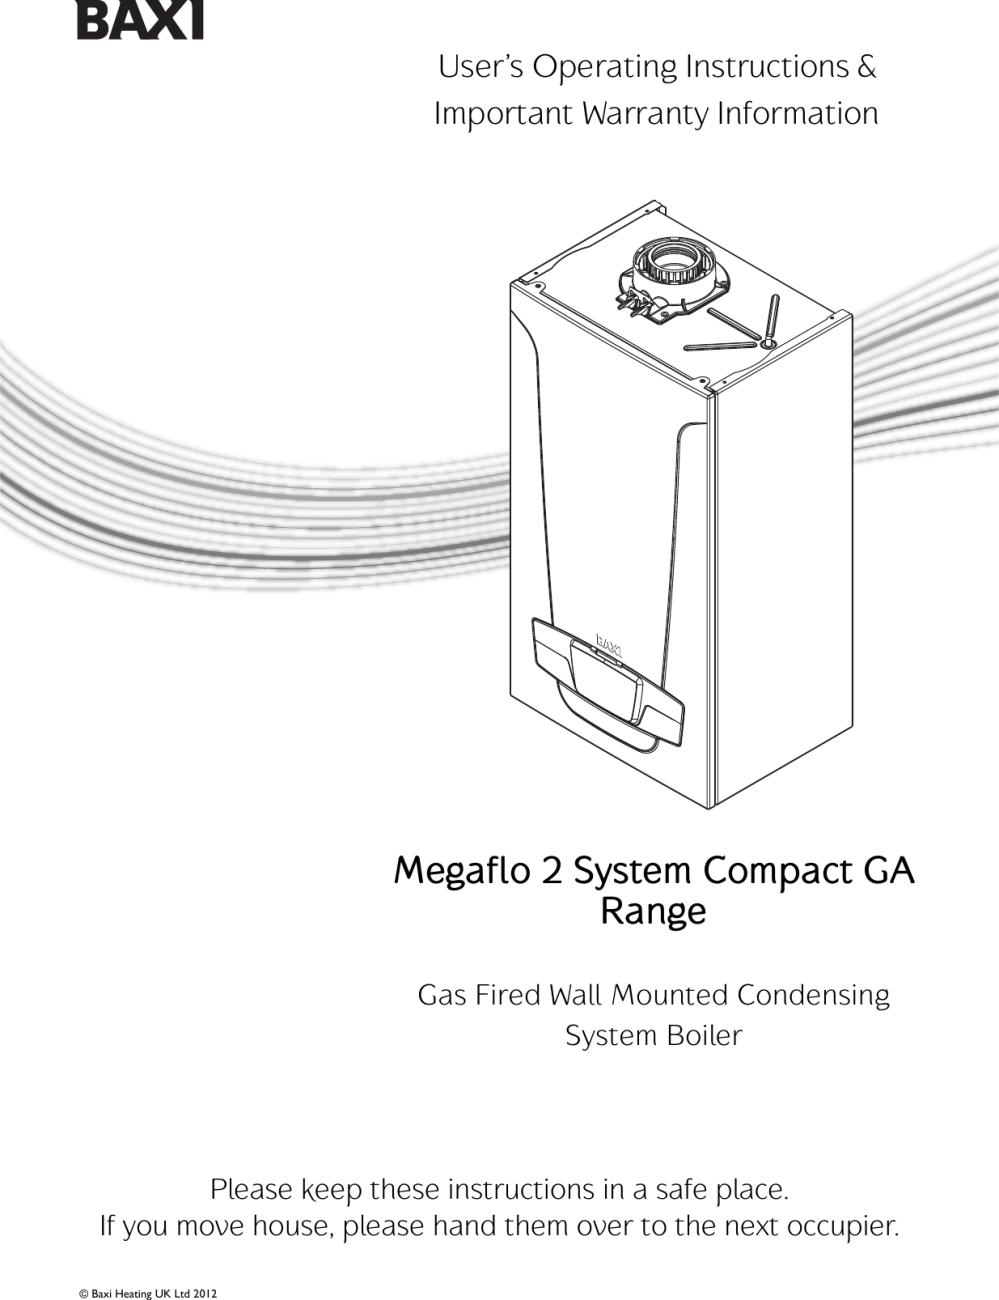 medium resolution of page 1 of 12 baxi baxi megaflo system compact ga